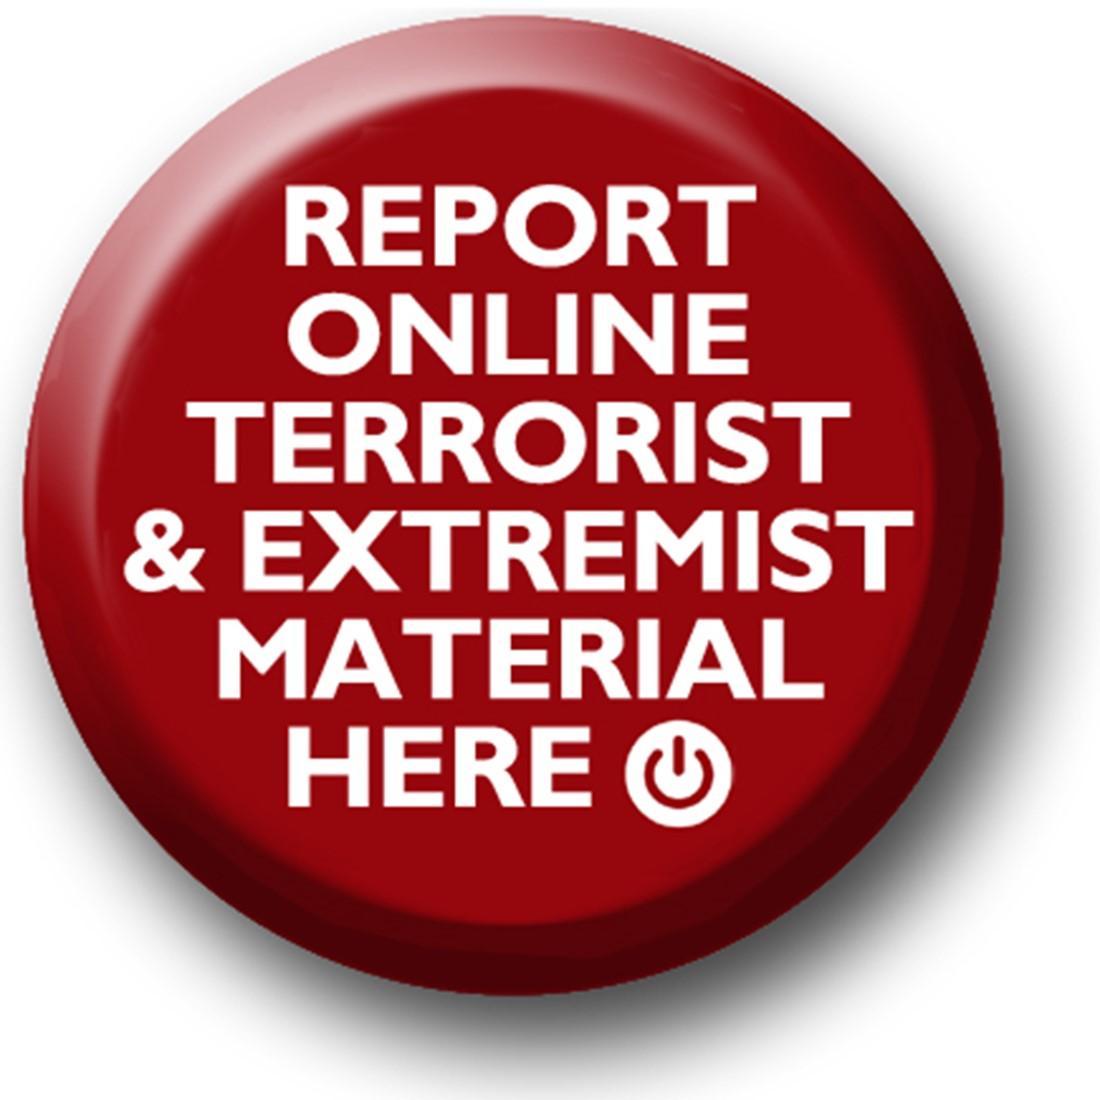 Report Online Terrorism button